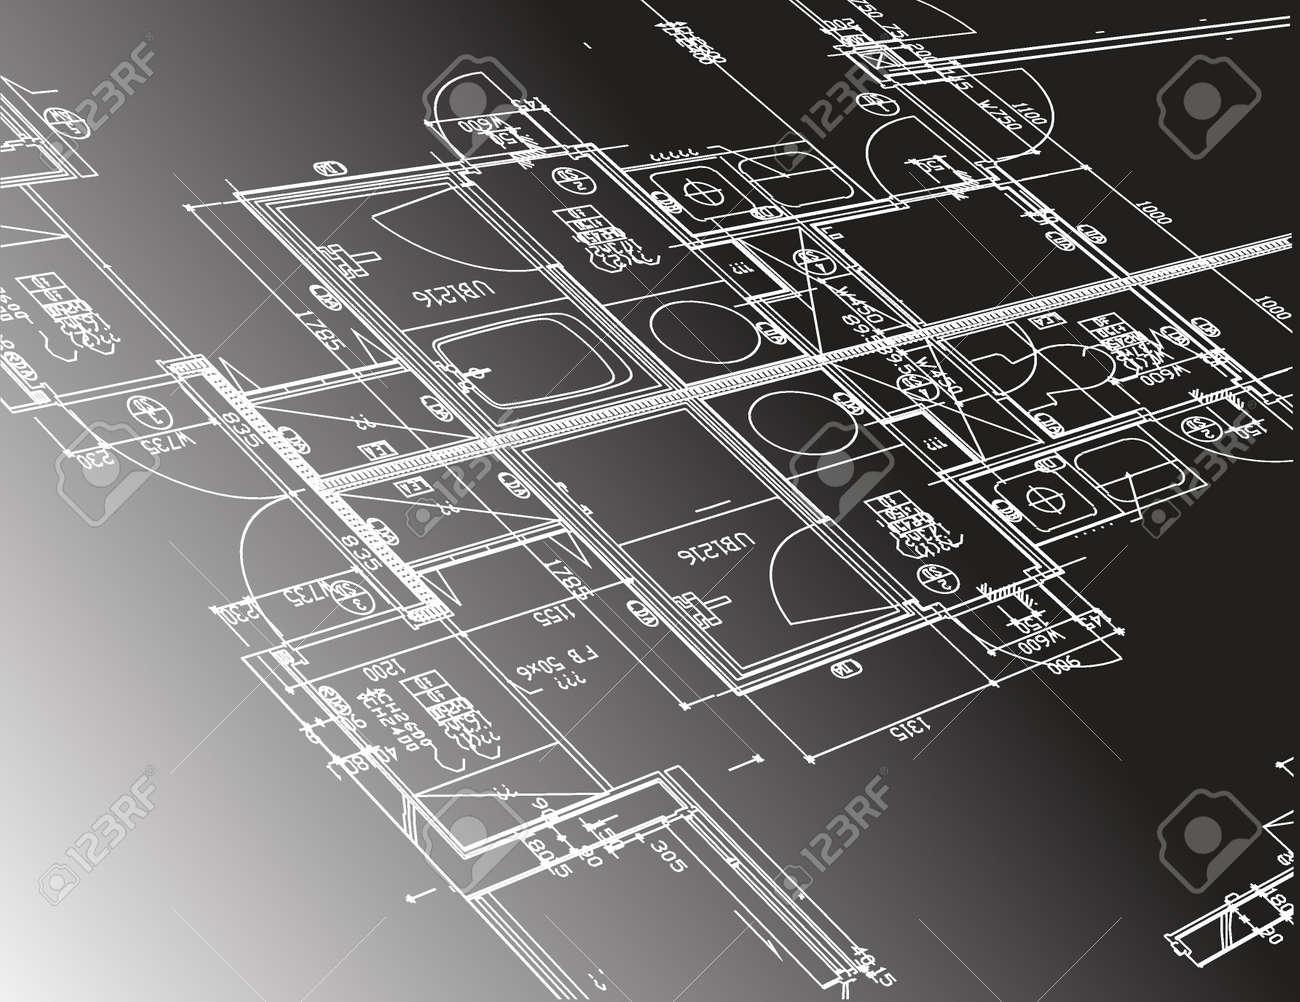 Architecture Design Background architecture design background in inspiration